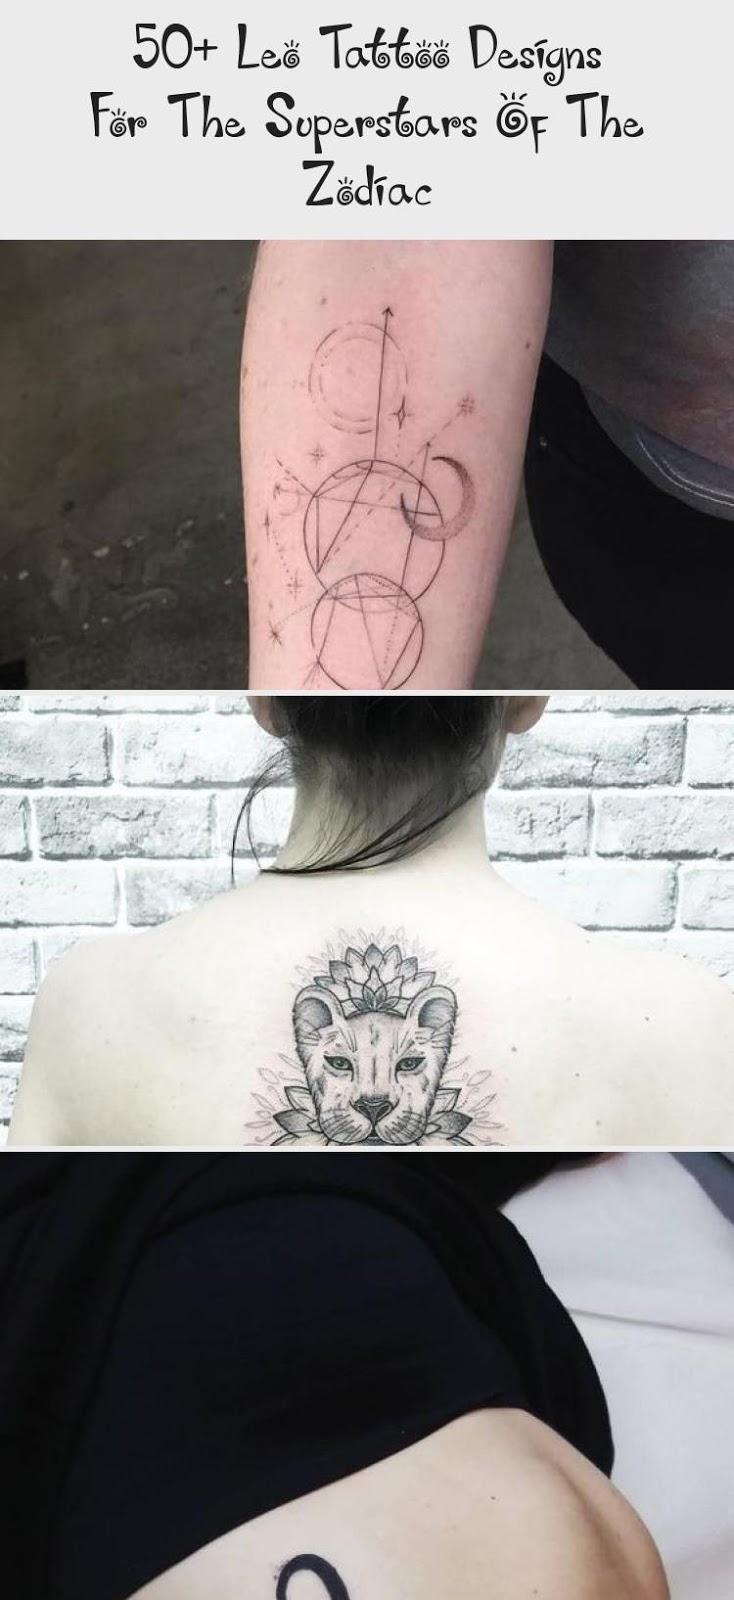 Leo Zodiac Horoscope Sign Symbol Tattoo Designs (46)